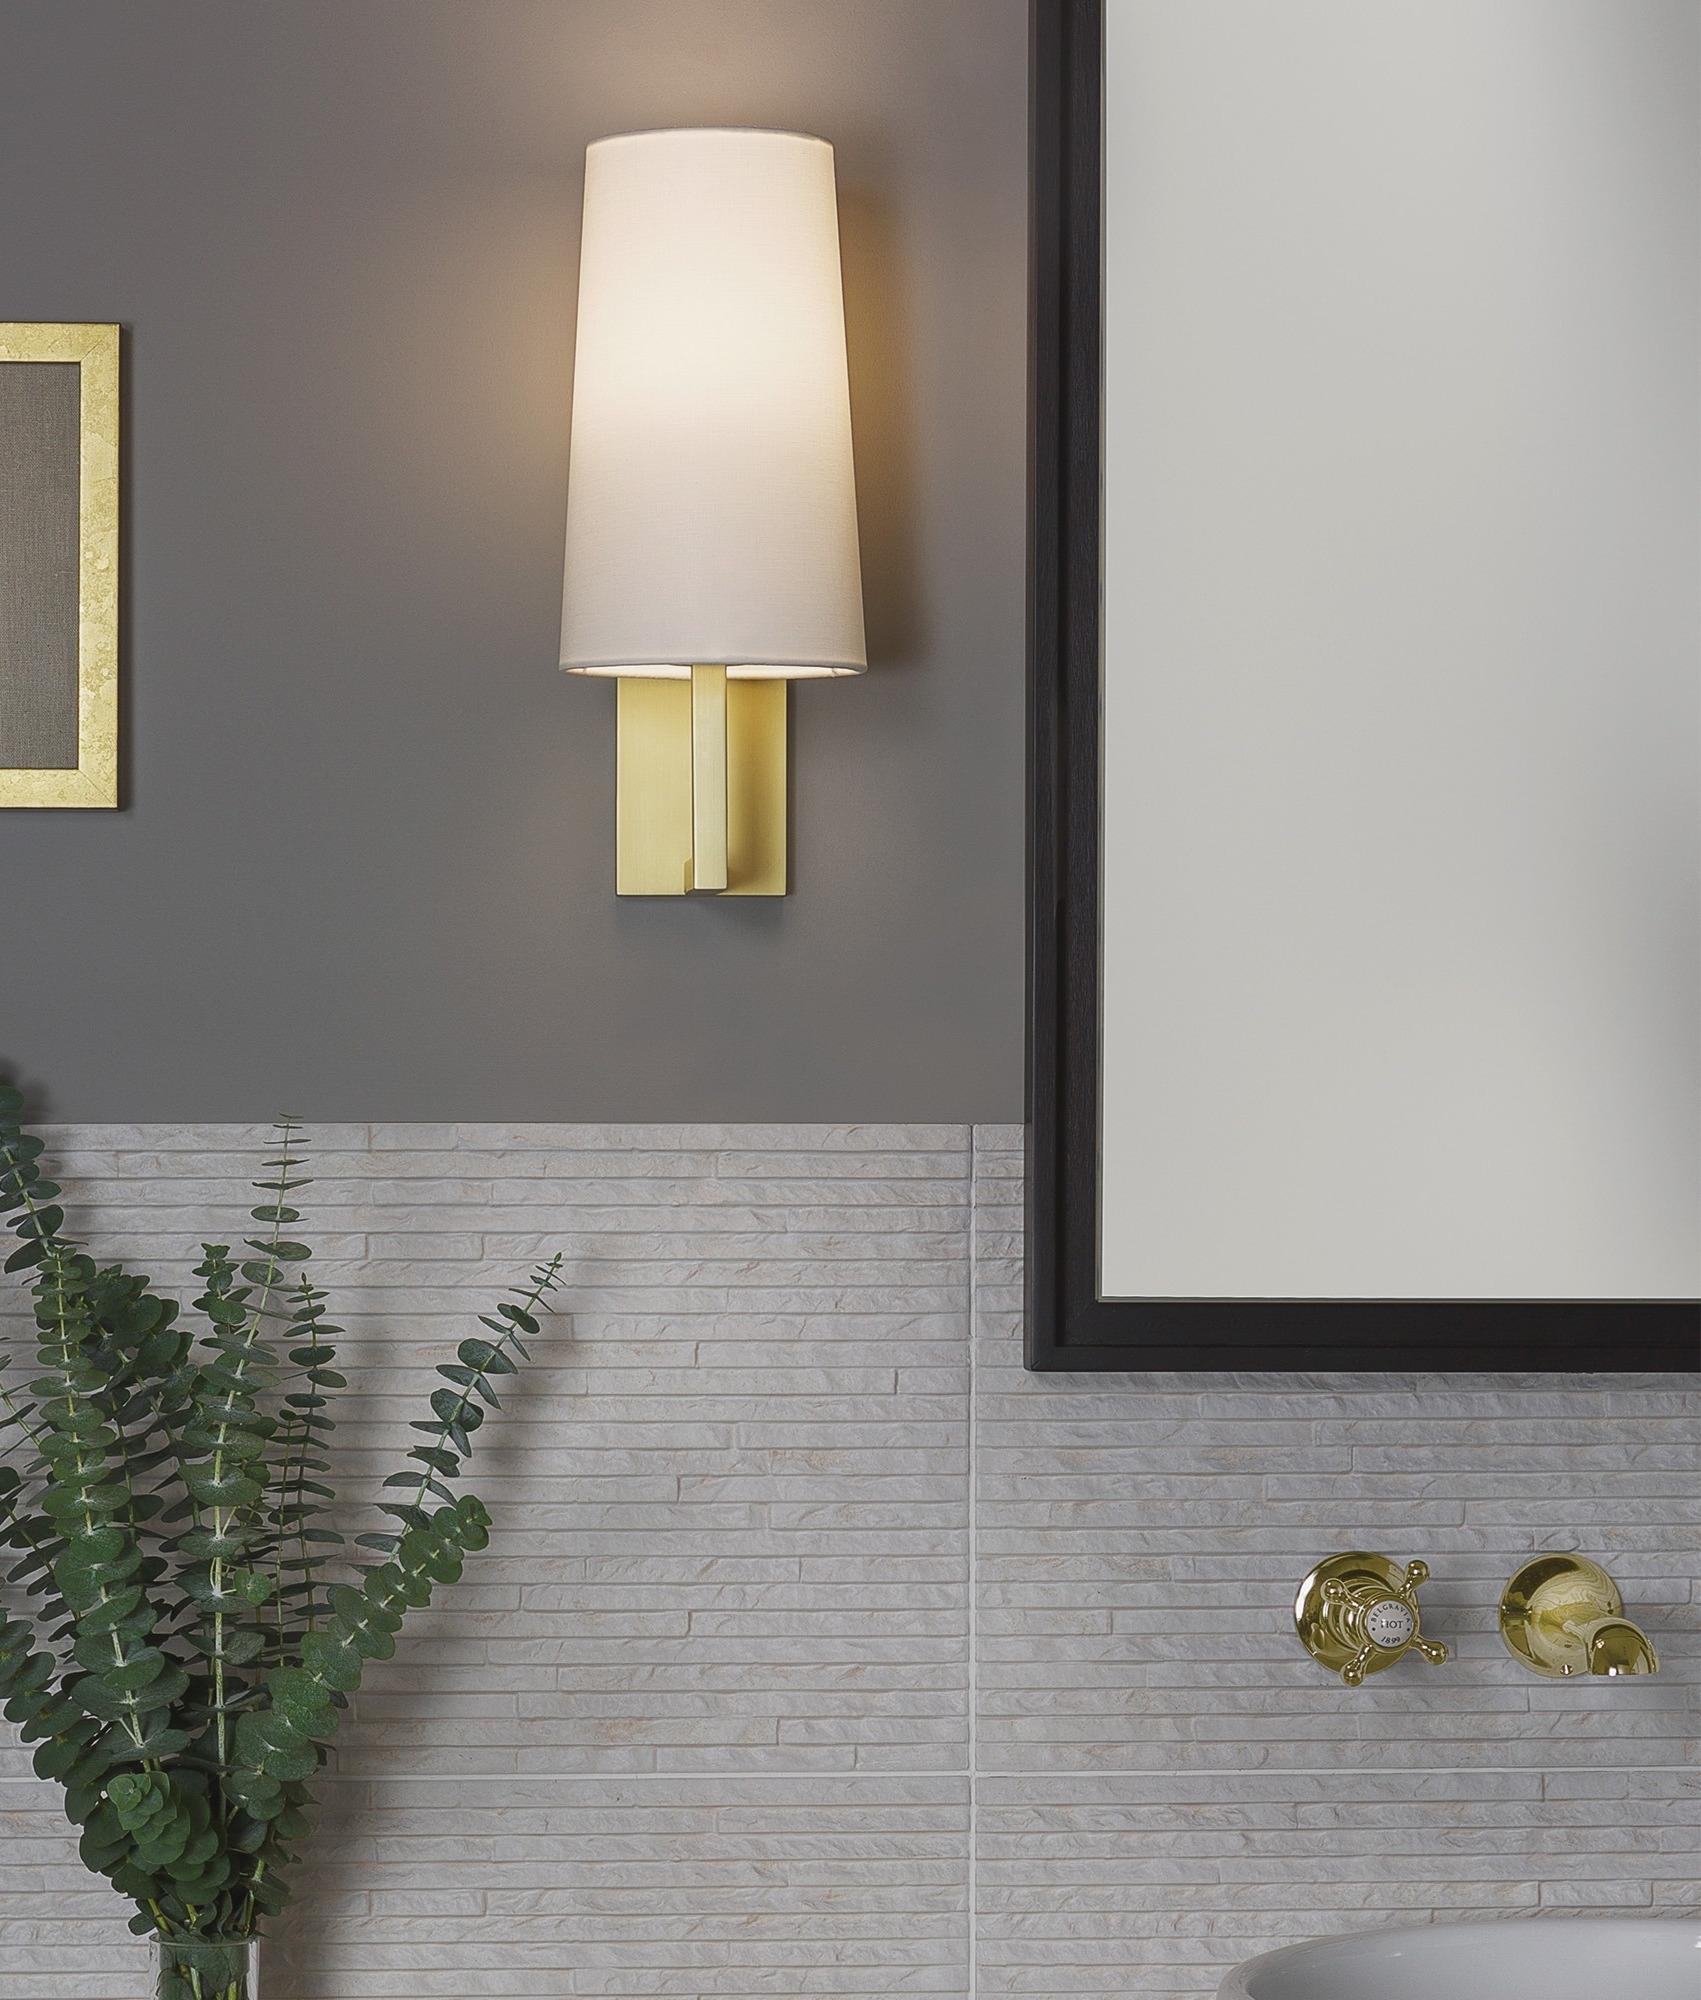 Slim Modern Wall Light With Matt Gold Bracket And Tapered